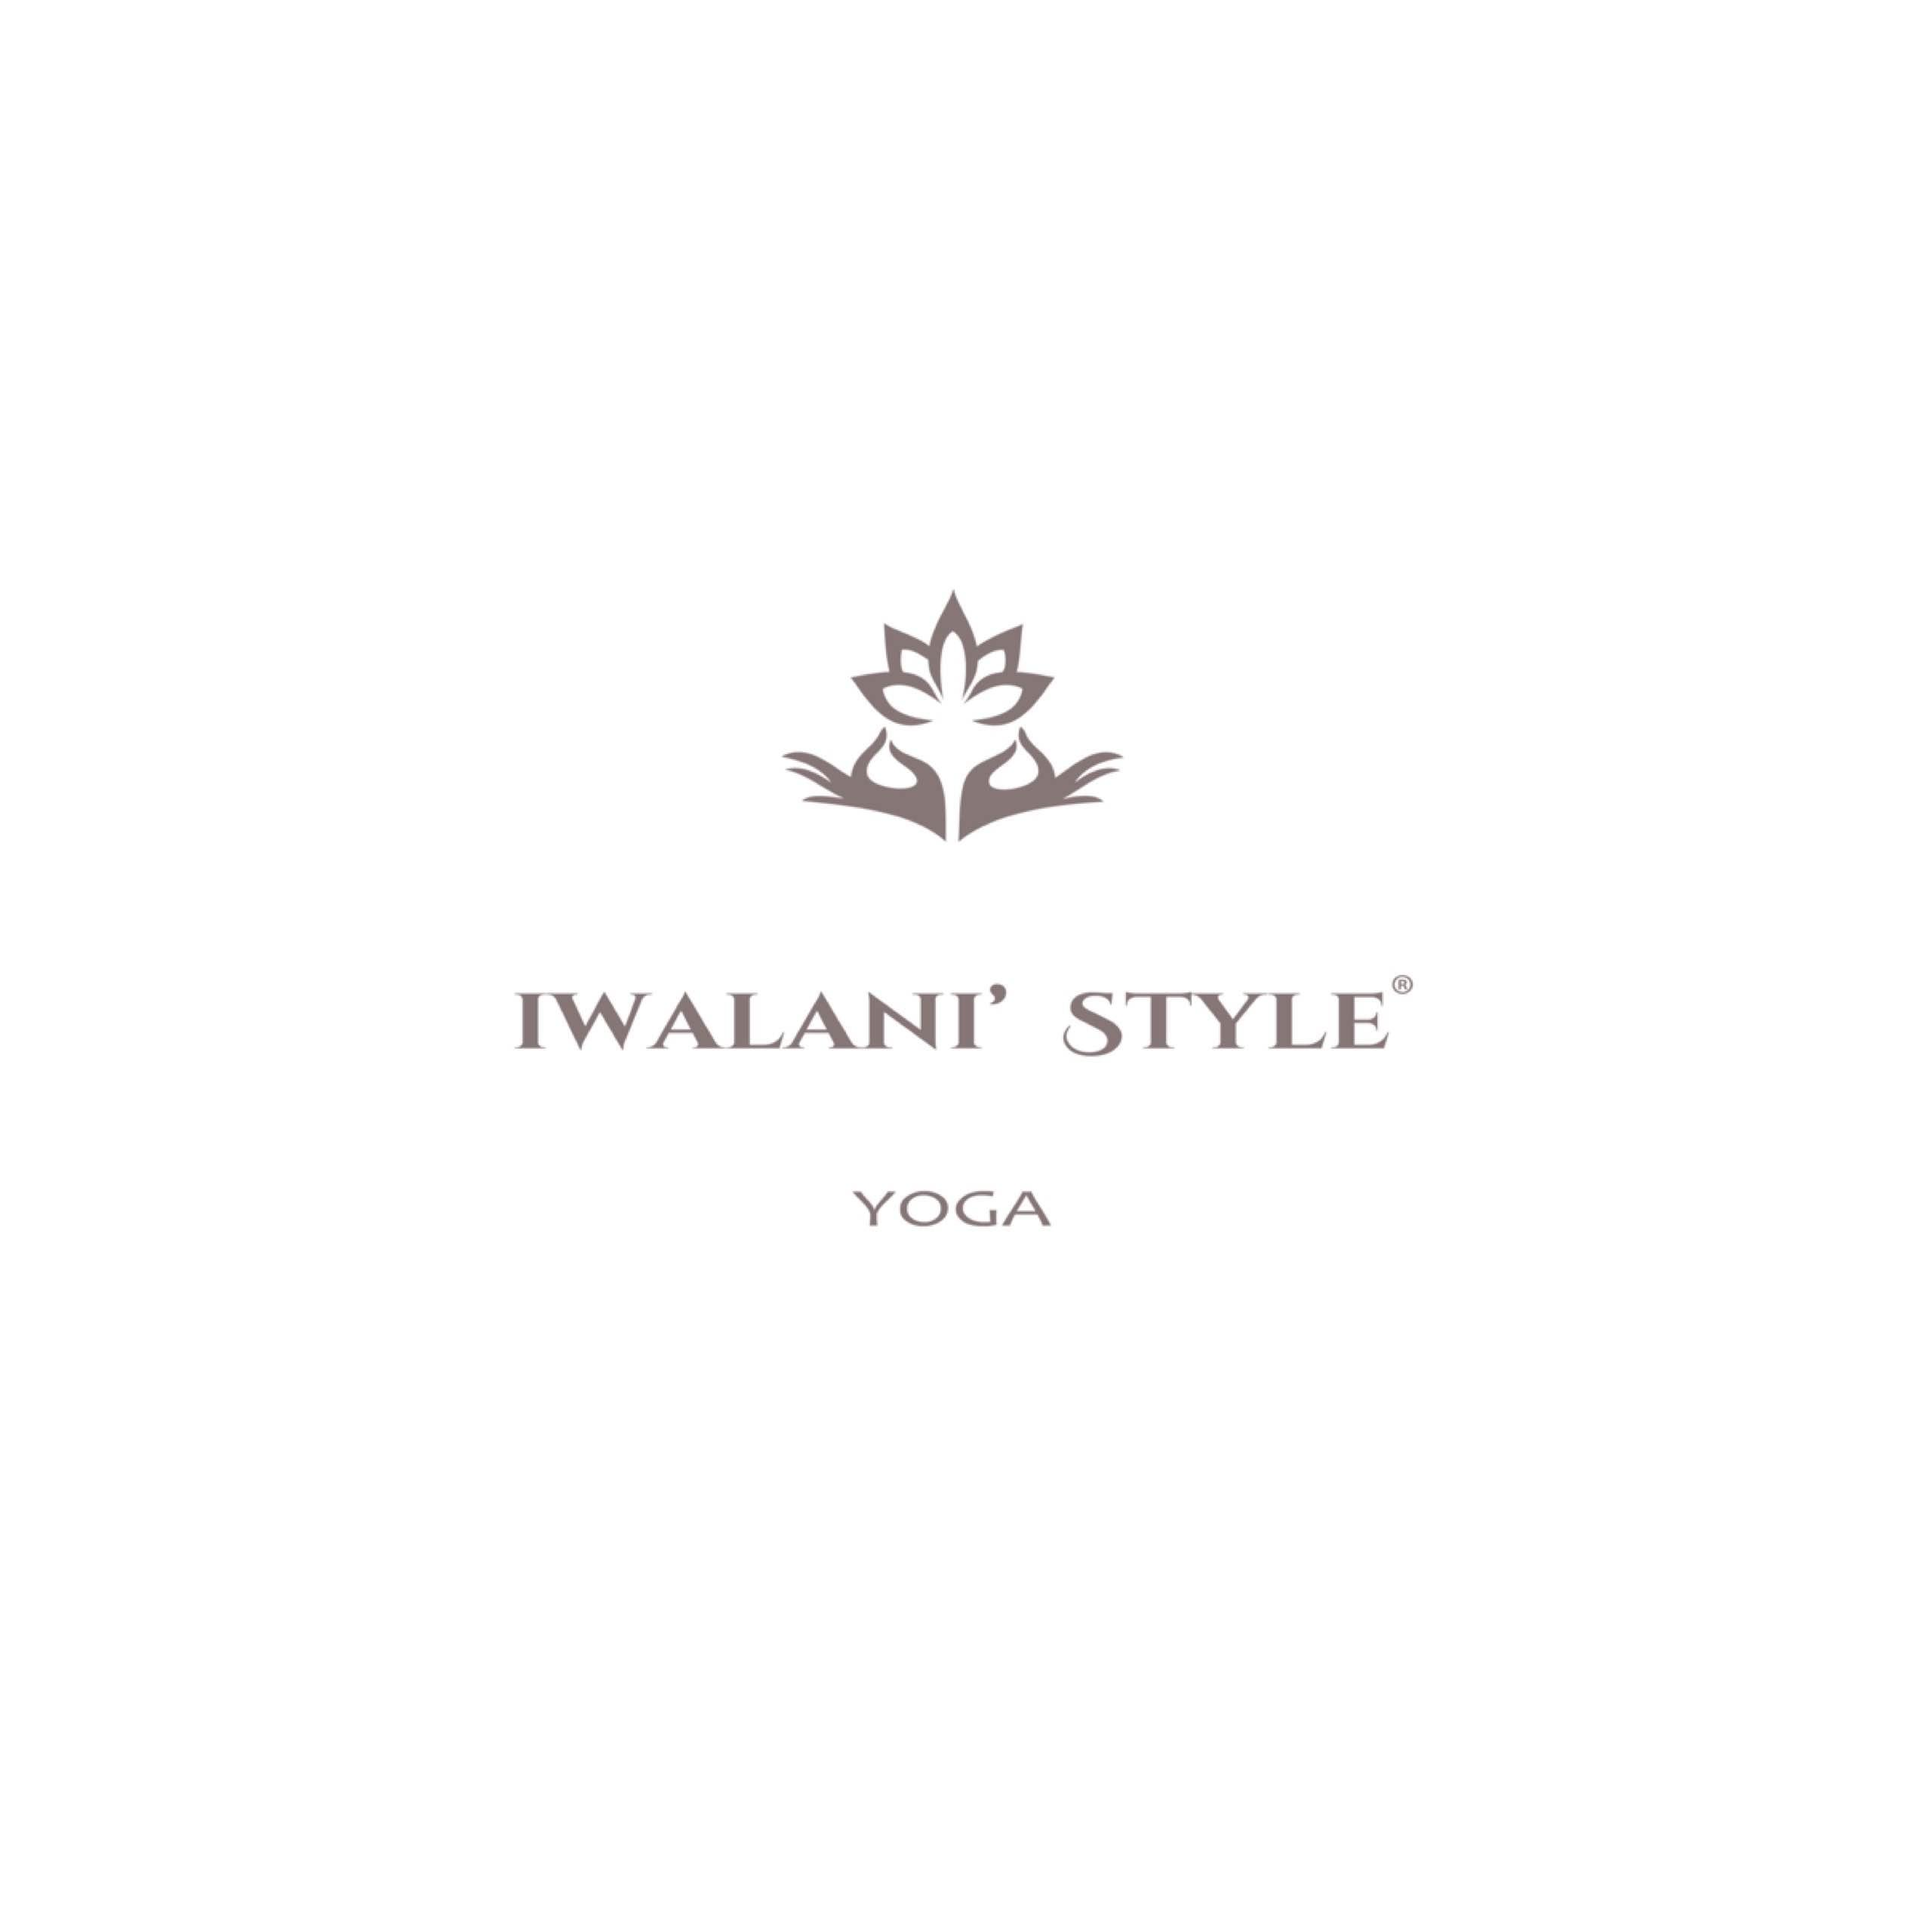 IWALANI' STYLE YOGA / ヨガ & ピラティス教室